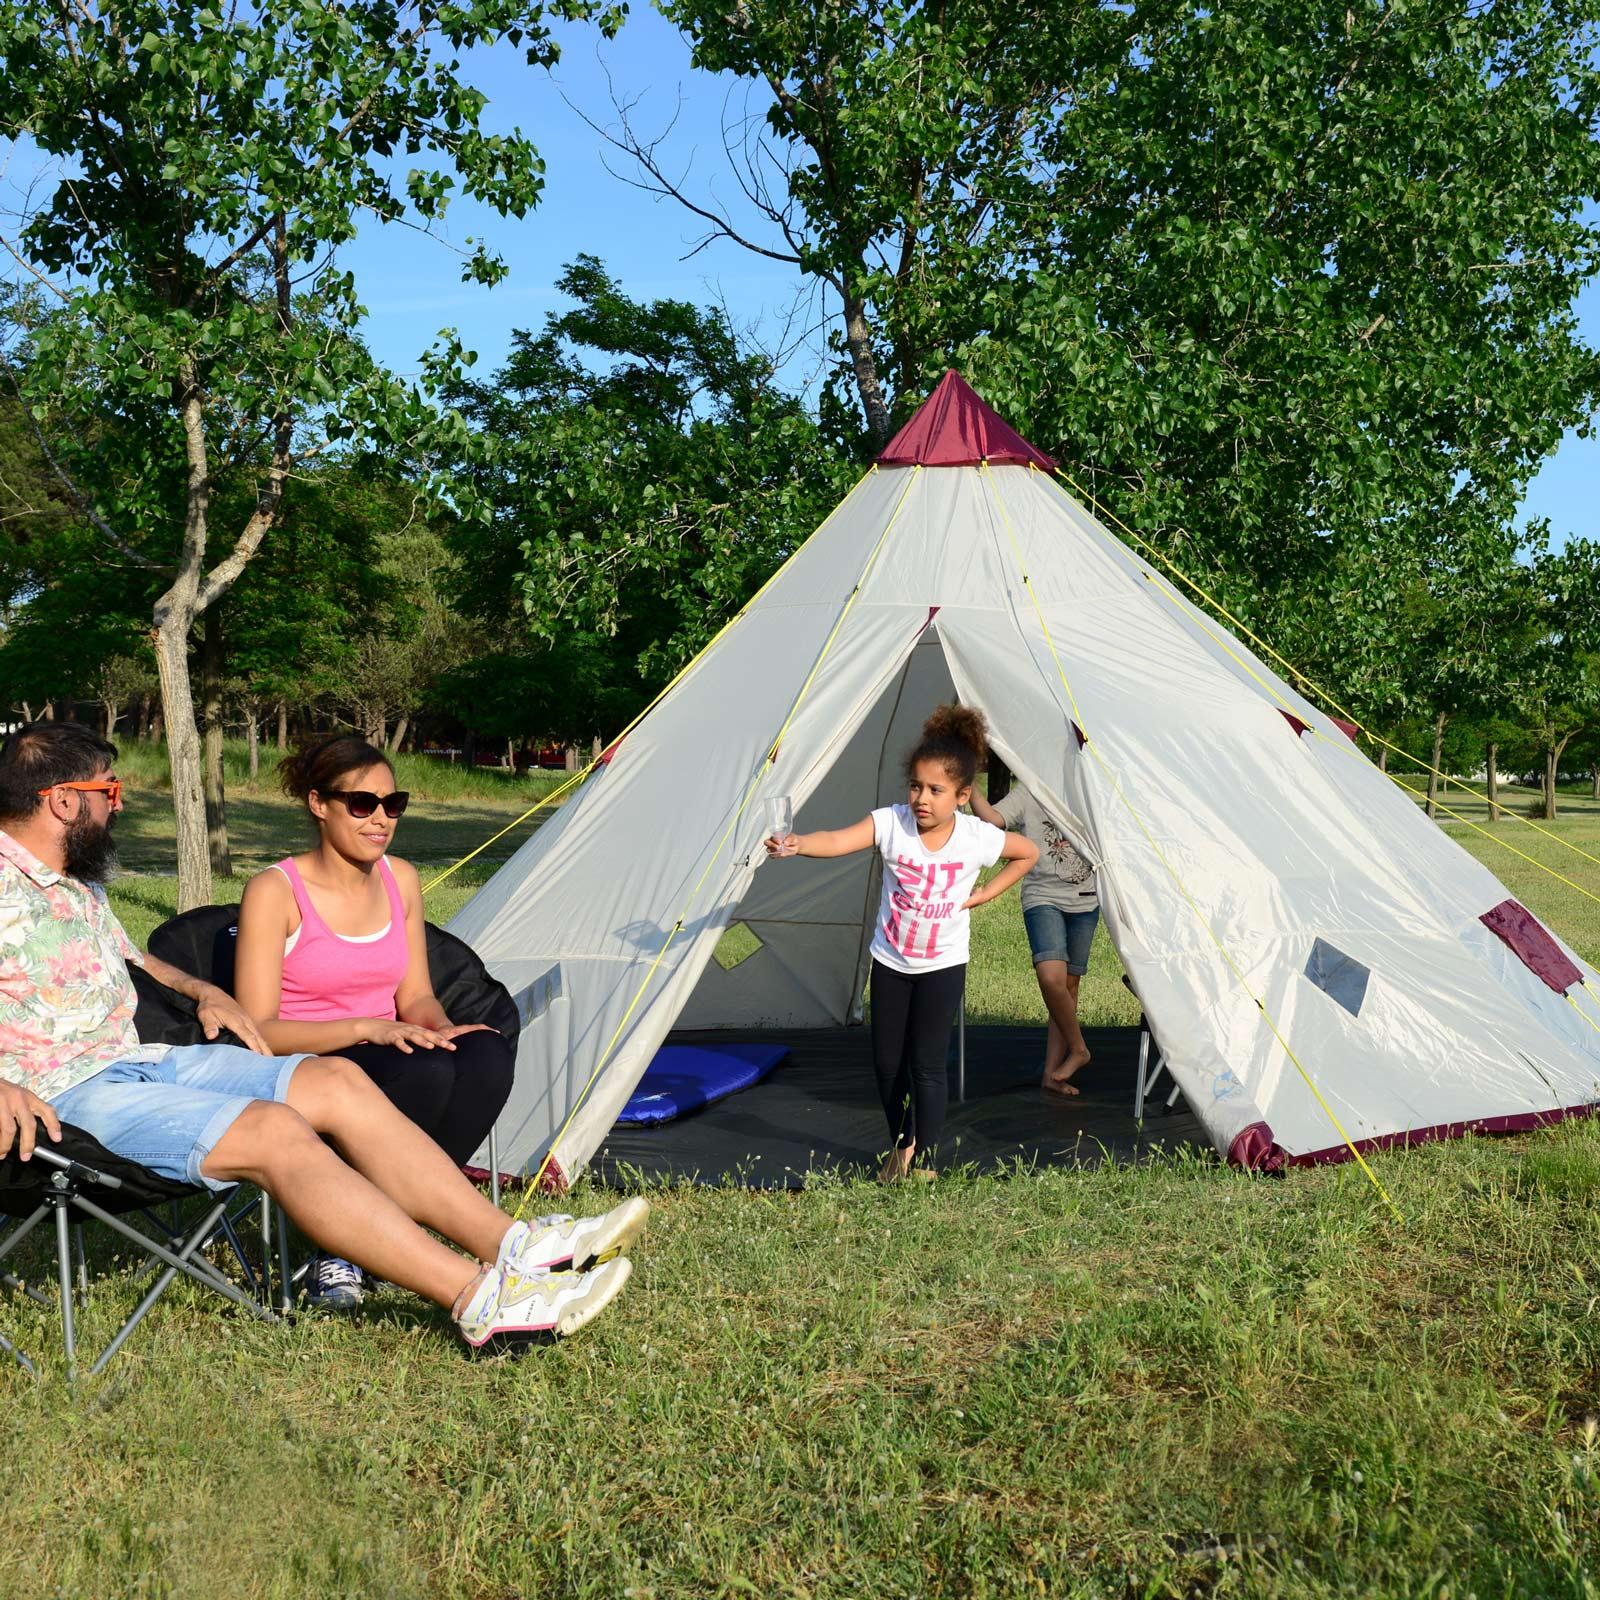 skandika-Teepee-250-Camping-Party-Festival-Tent-2-5-M-Height-3000mm-Column-New thumbnail 3